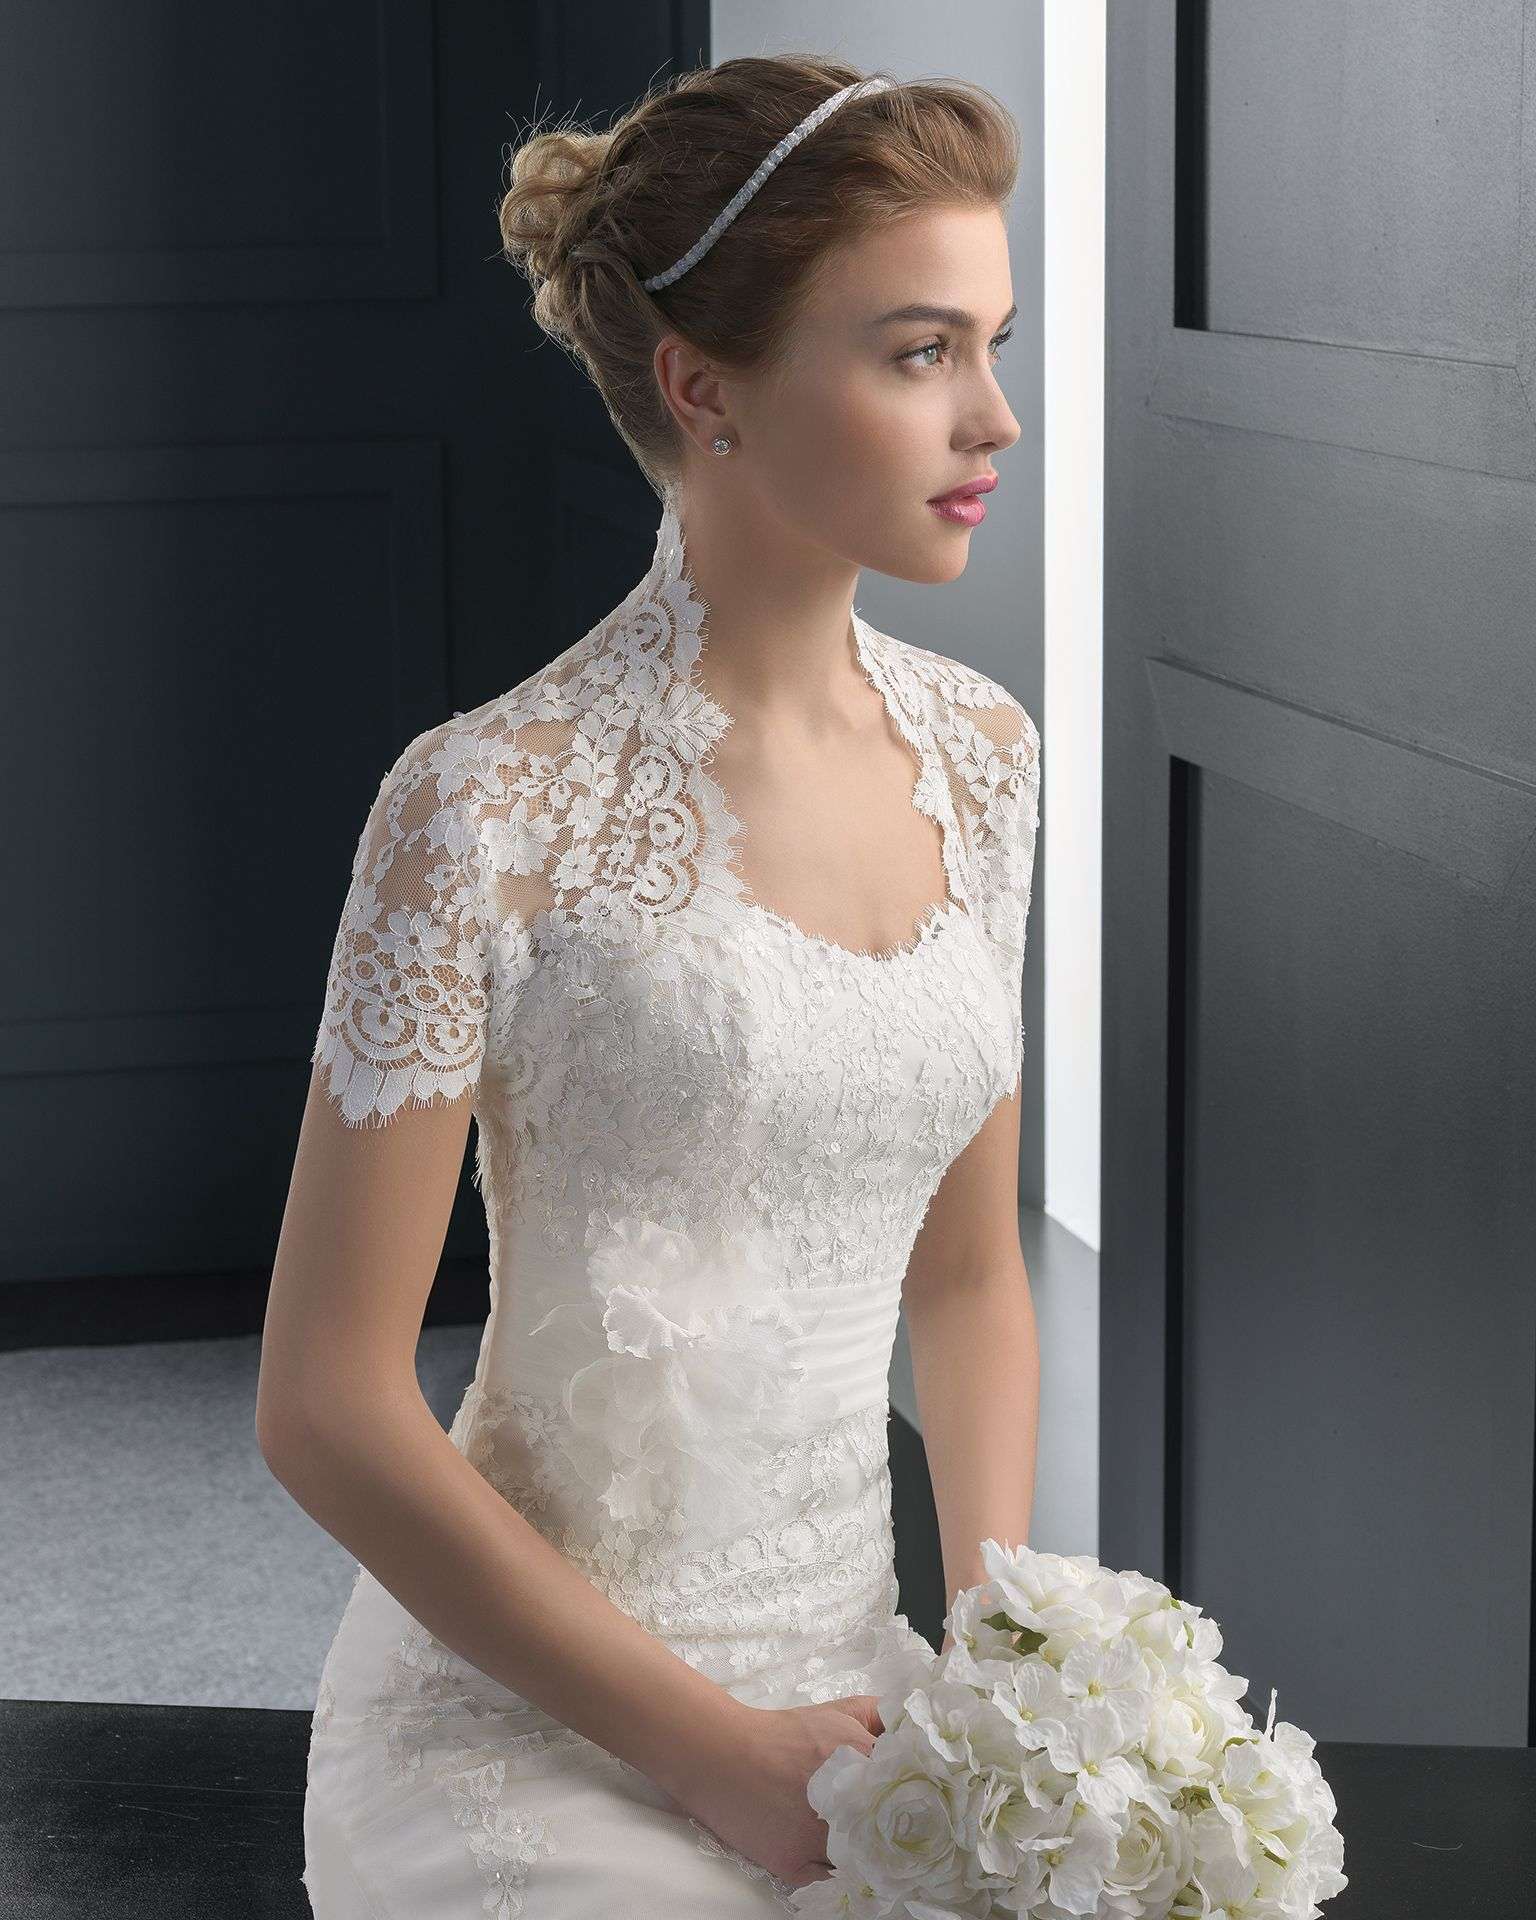 Rania novia corte sirena | Hochzeit Outfit | Pinterest | Traum ...